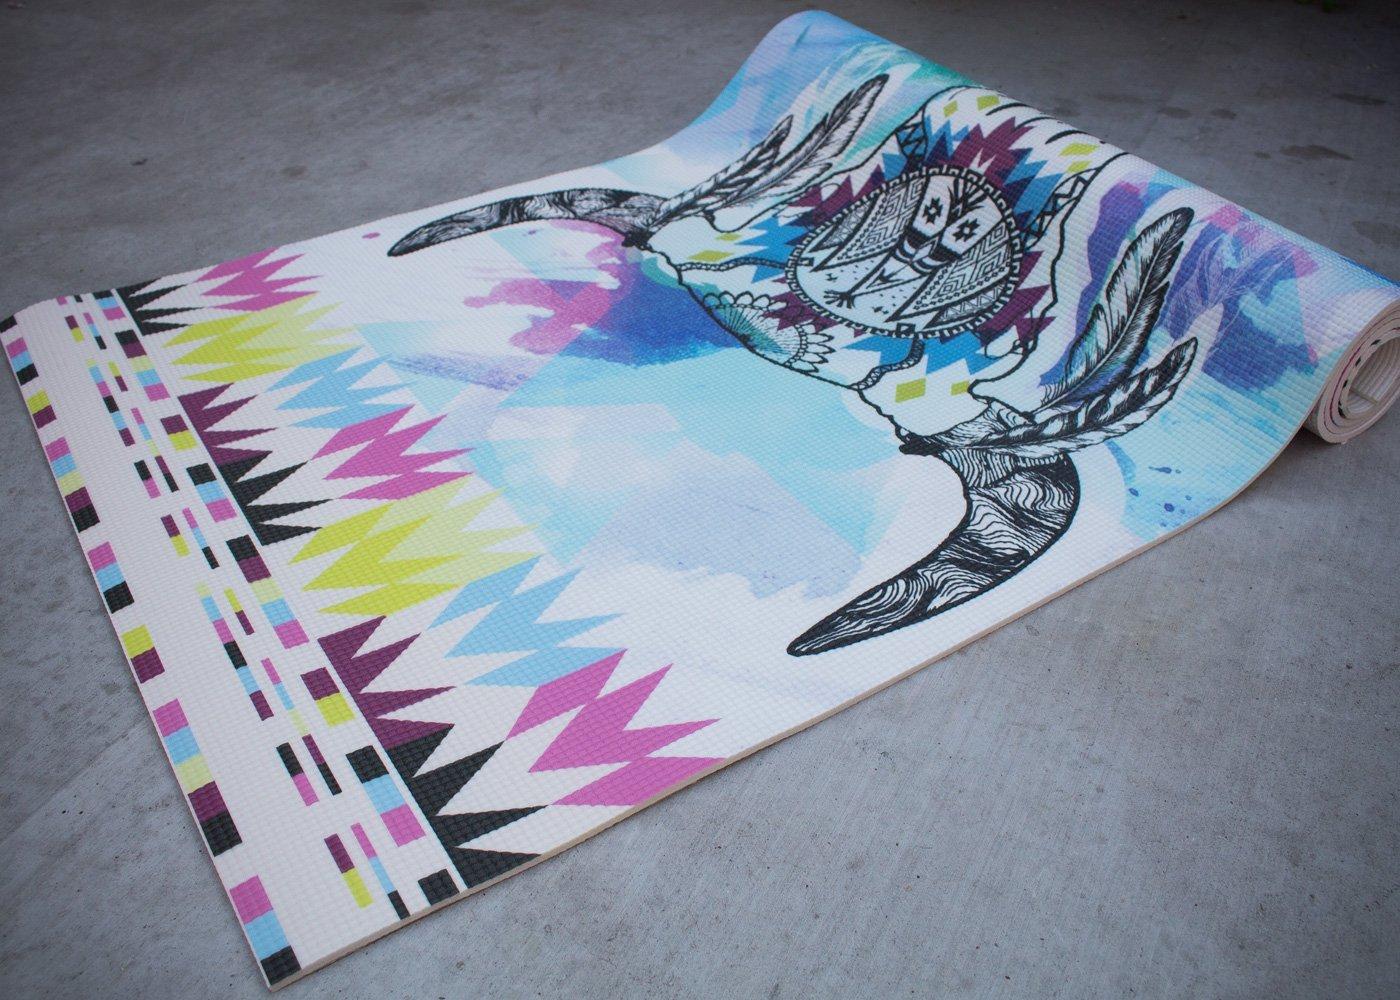 "Vagabond Goods 1/4"" Thick Premium Yoga Mat in ''Buffalo Dancer' Design"